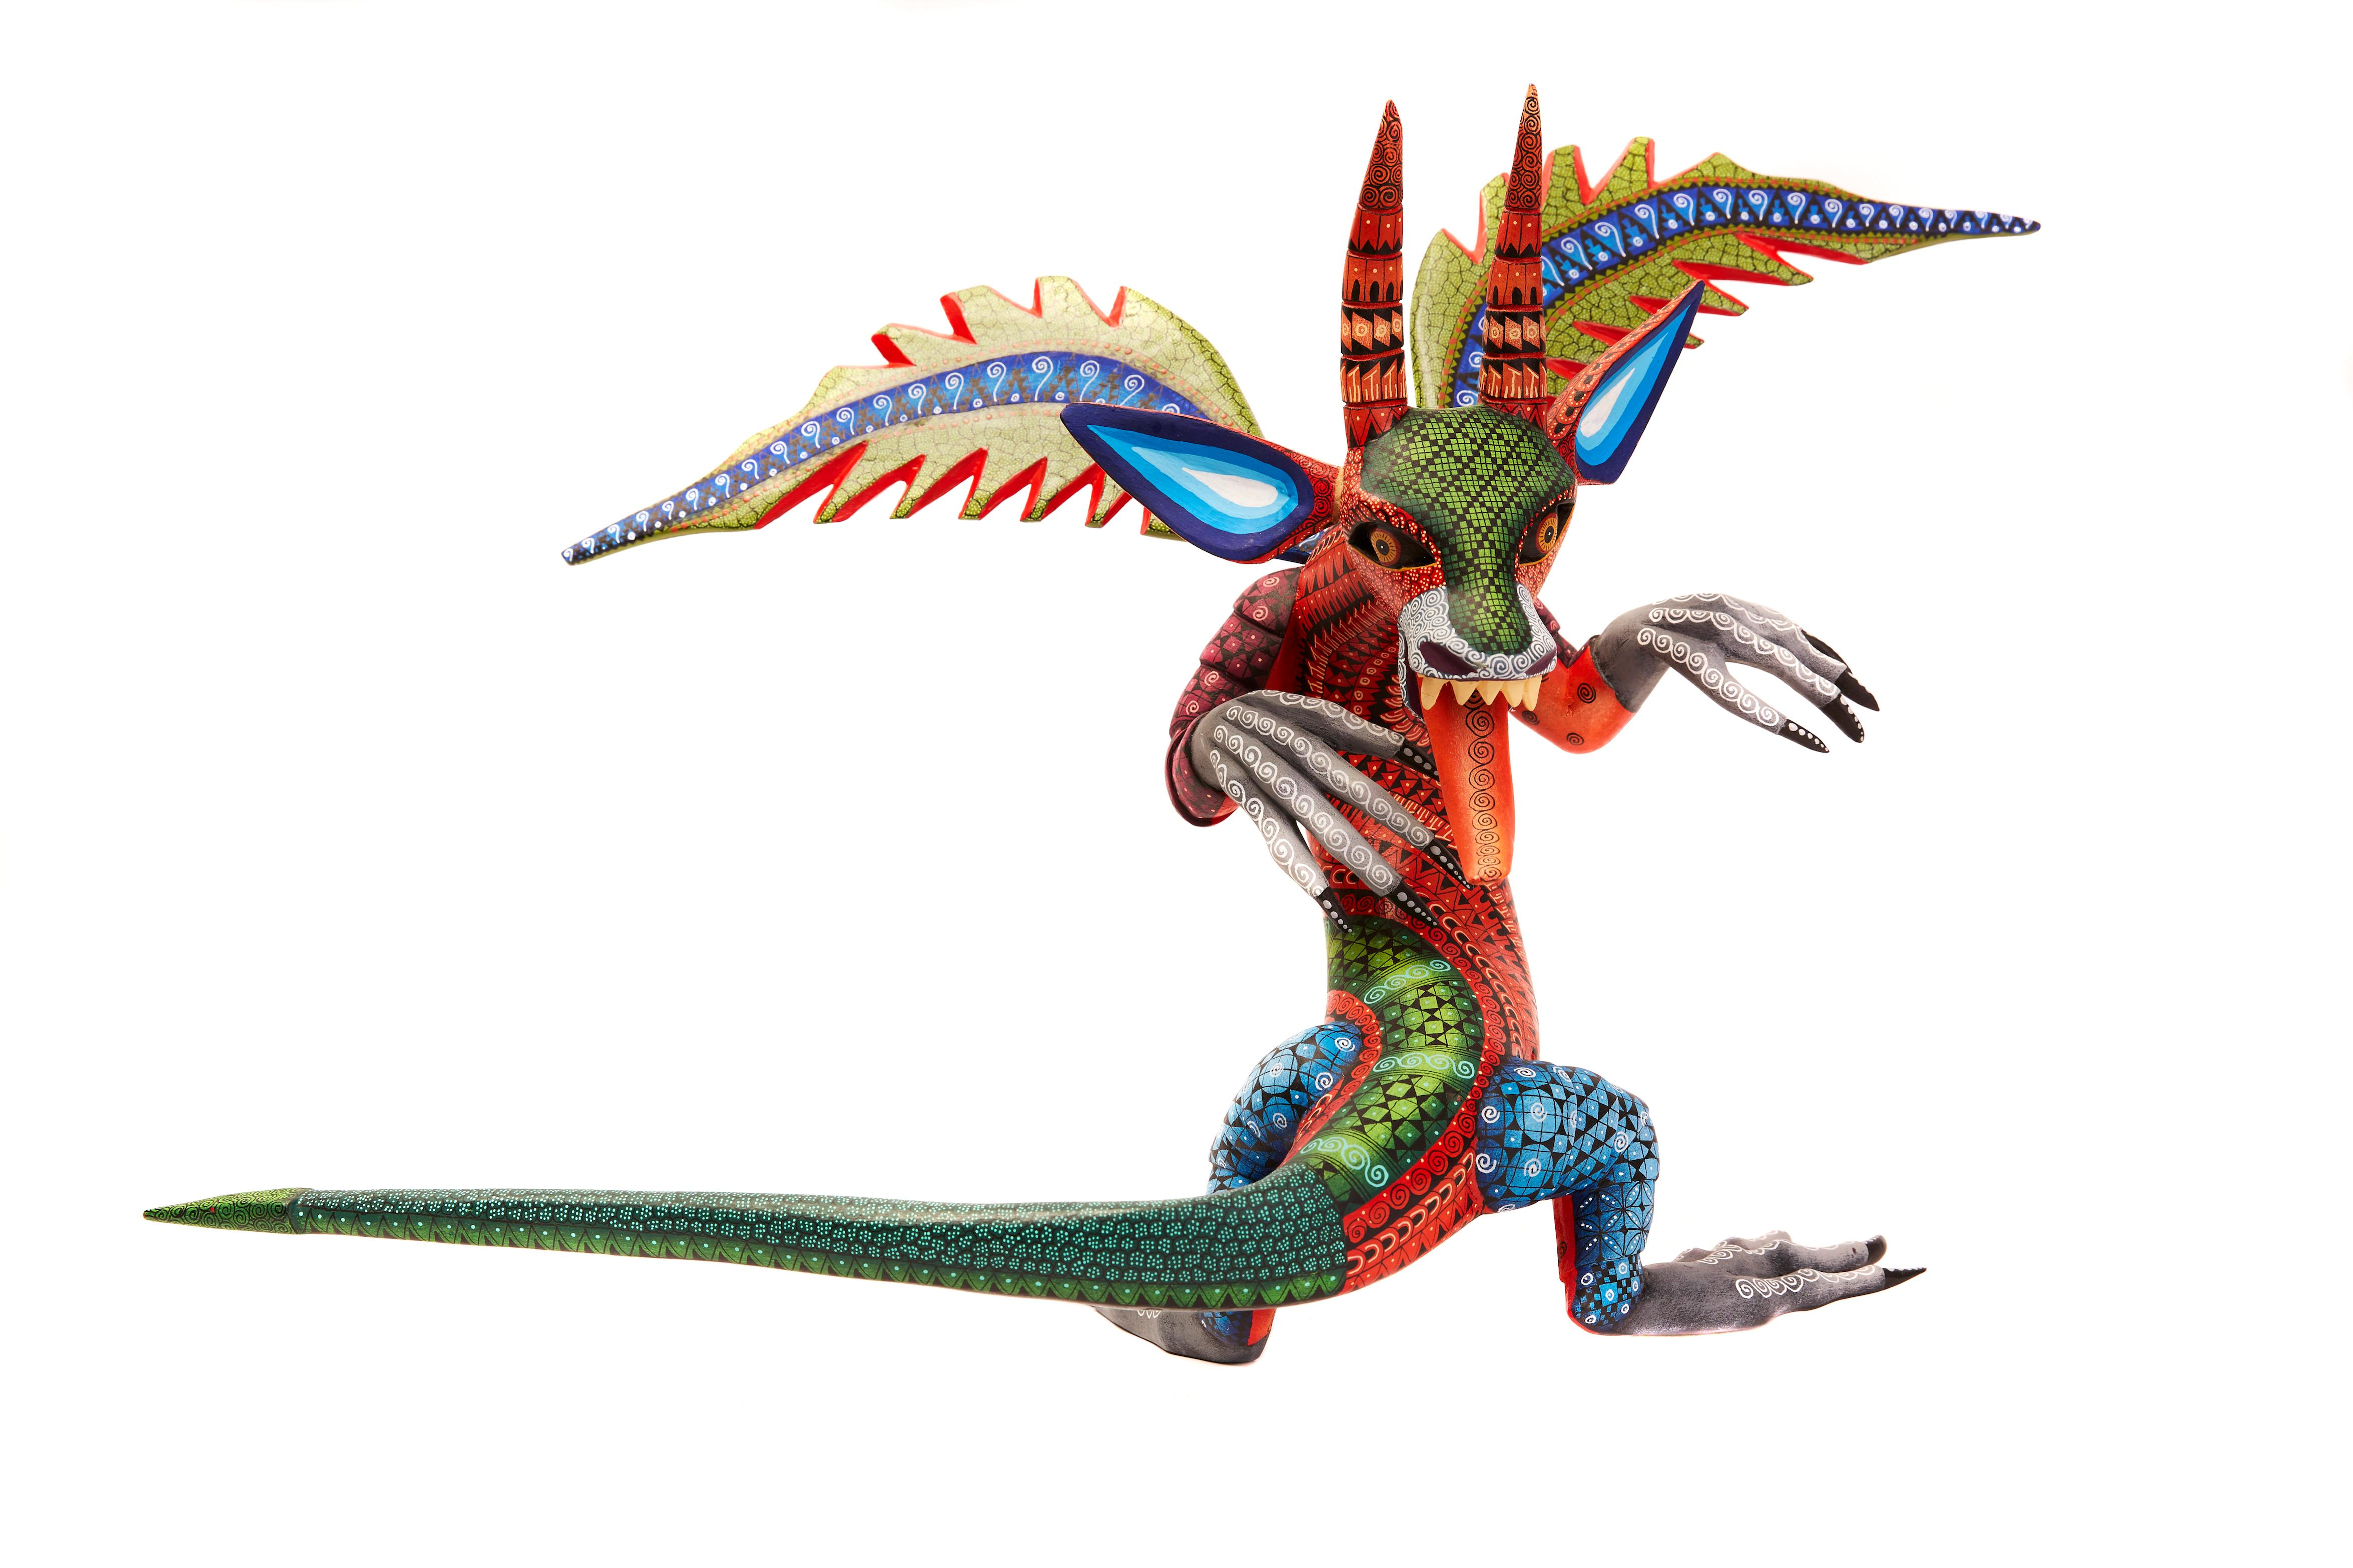 Dragon Fantastico - Fantastic Dragon Alebrije - Mexican Folk Art - Wood Carving